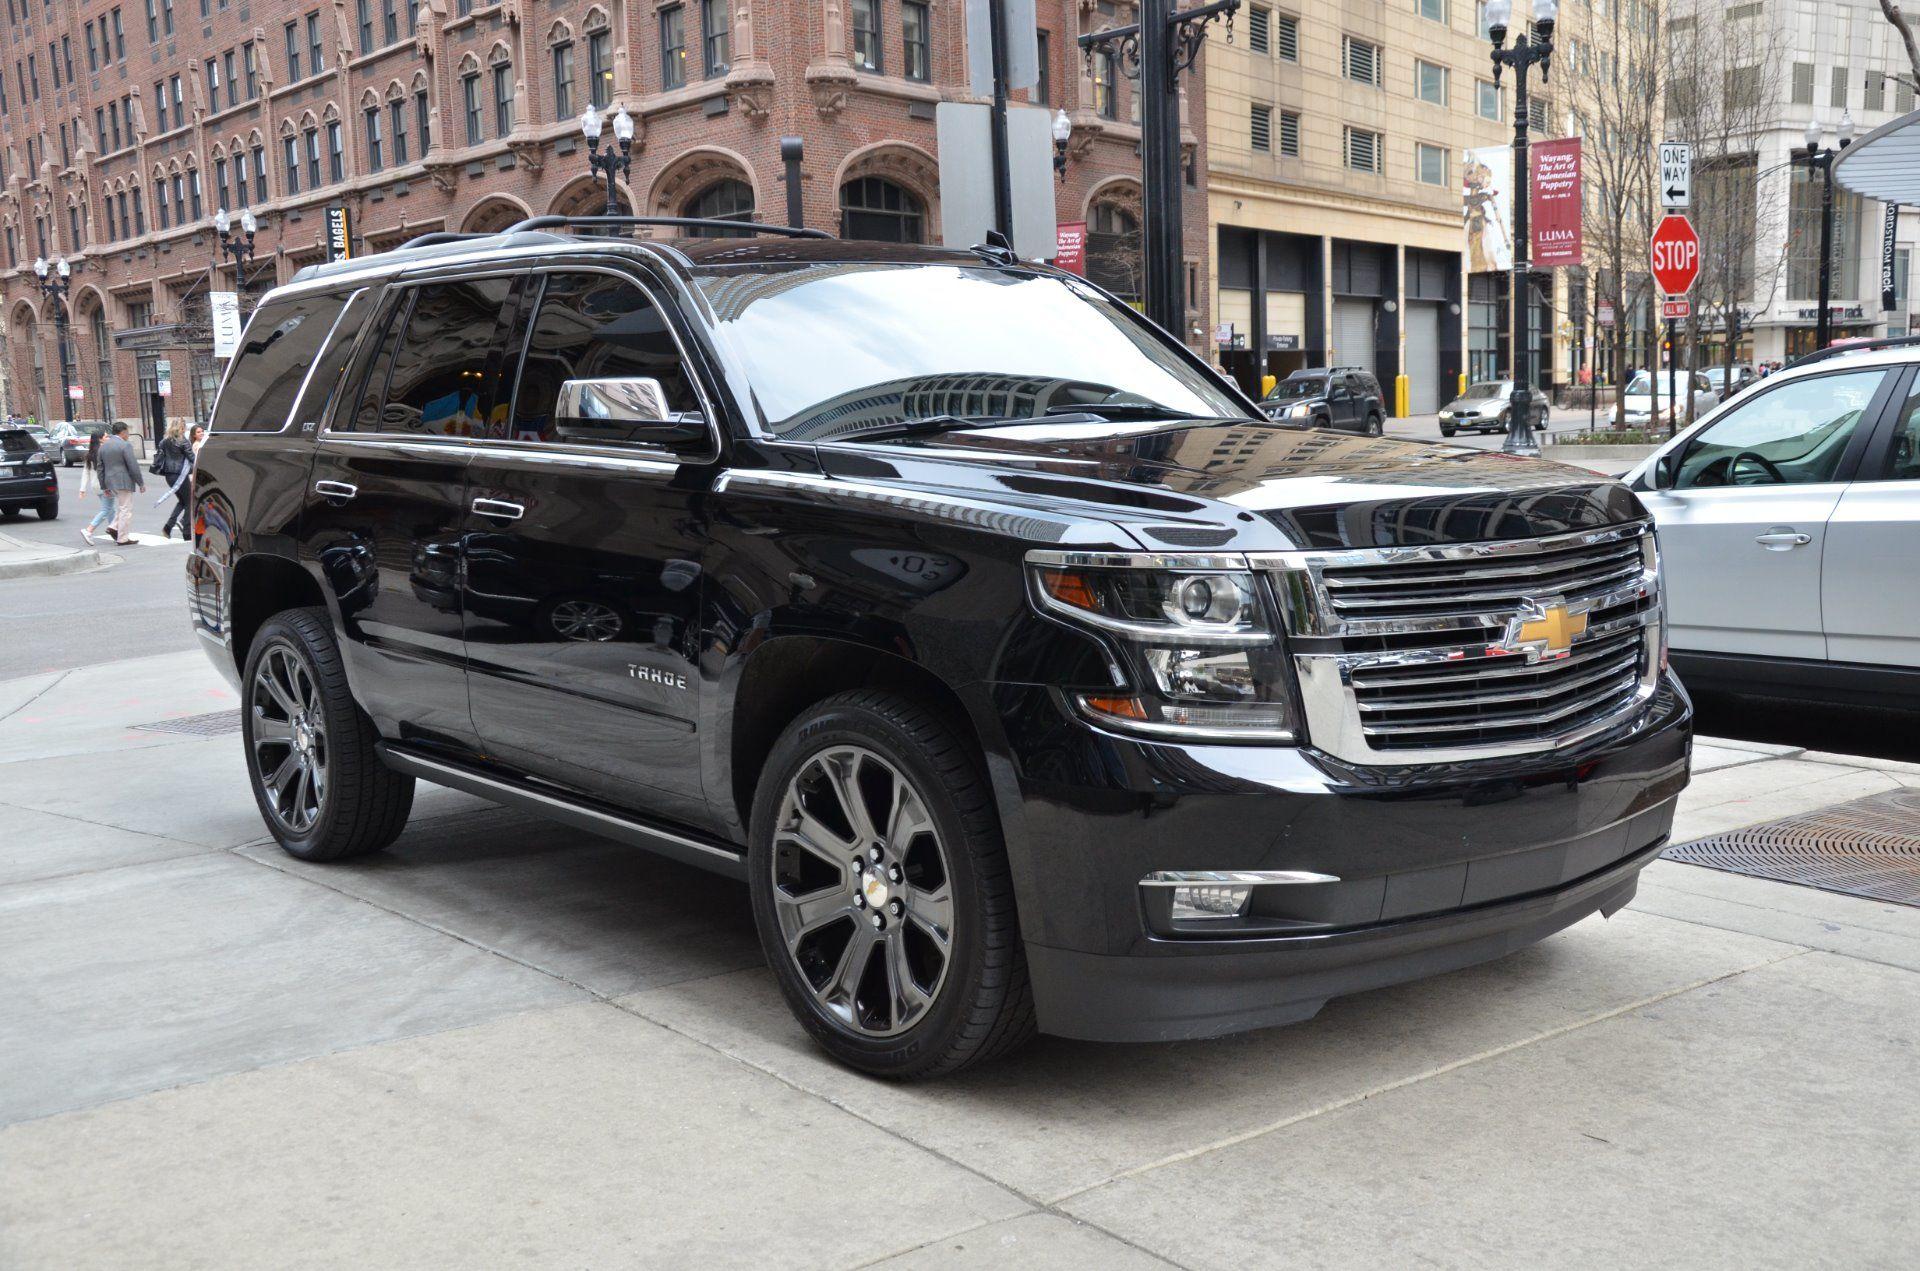 2016 Chevrolet Tahoe Ltz Stock M468a For Sale Near Di 2020